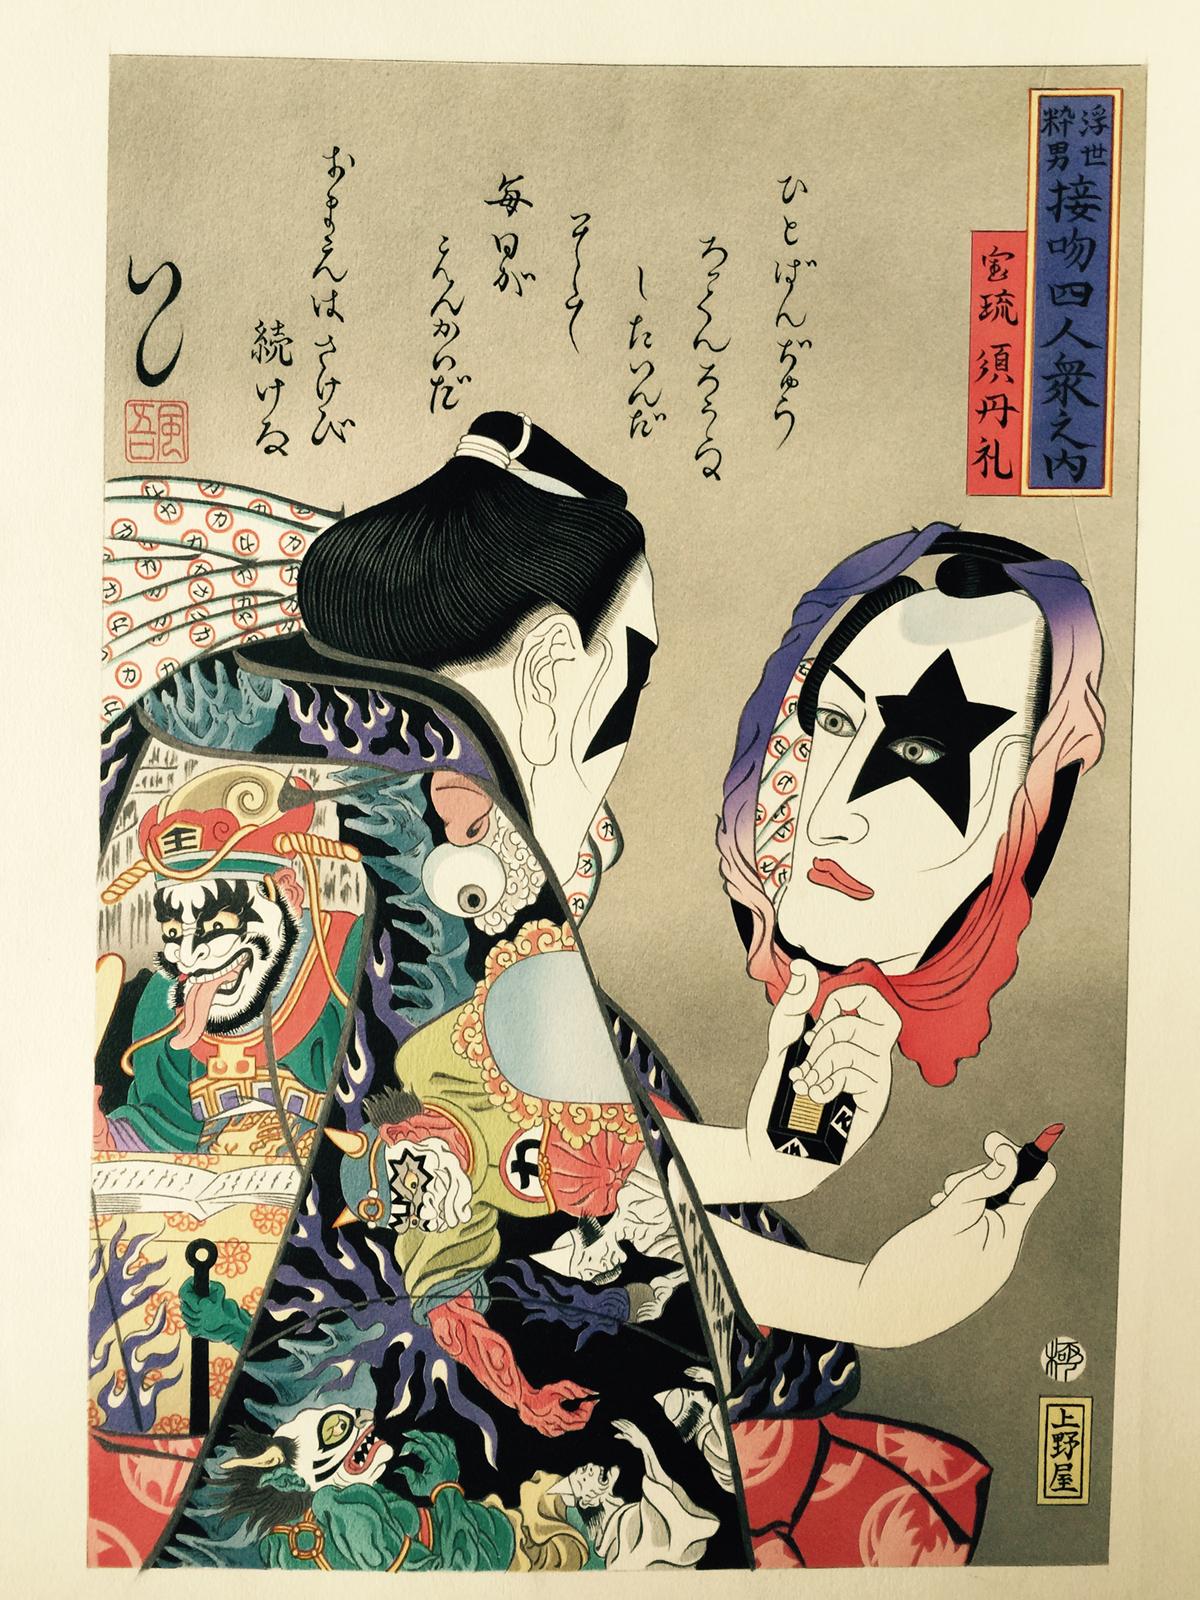 KISS×浮世絵 第3弾「浮世粋男接吻四人衆之内宝琉須丹礼」